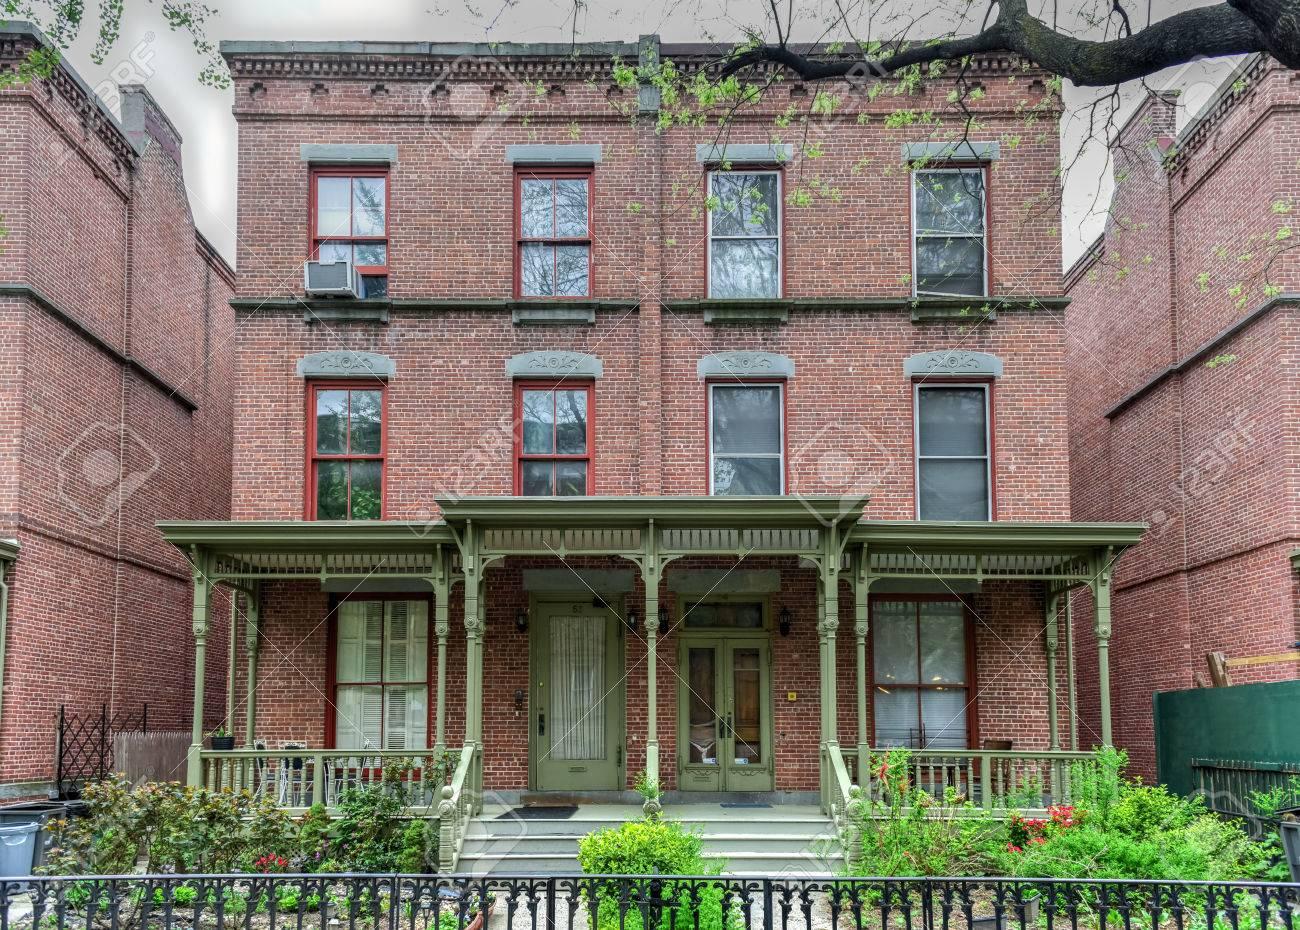 Fullsize Of Row House Harlem